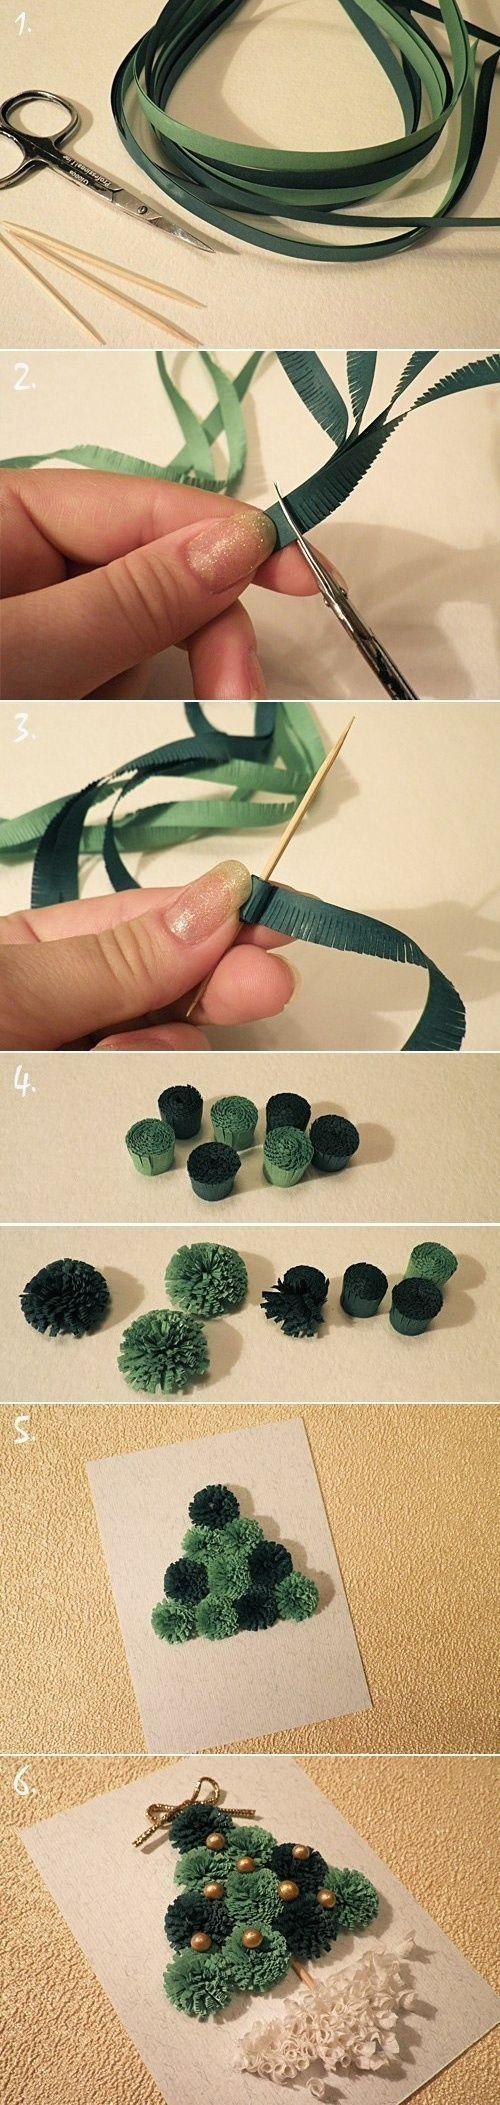 Perfect for mini trees